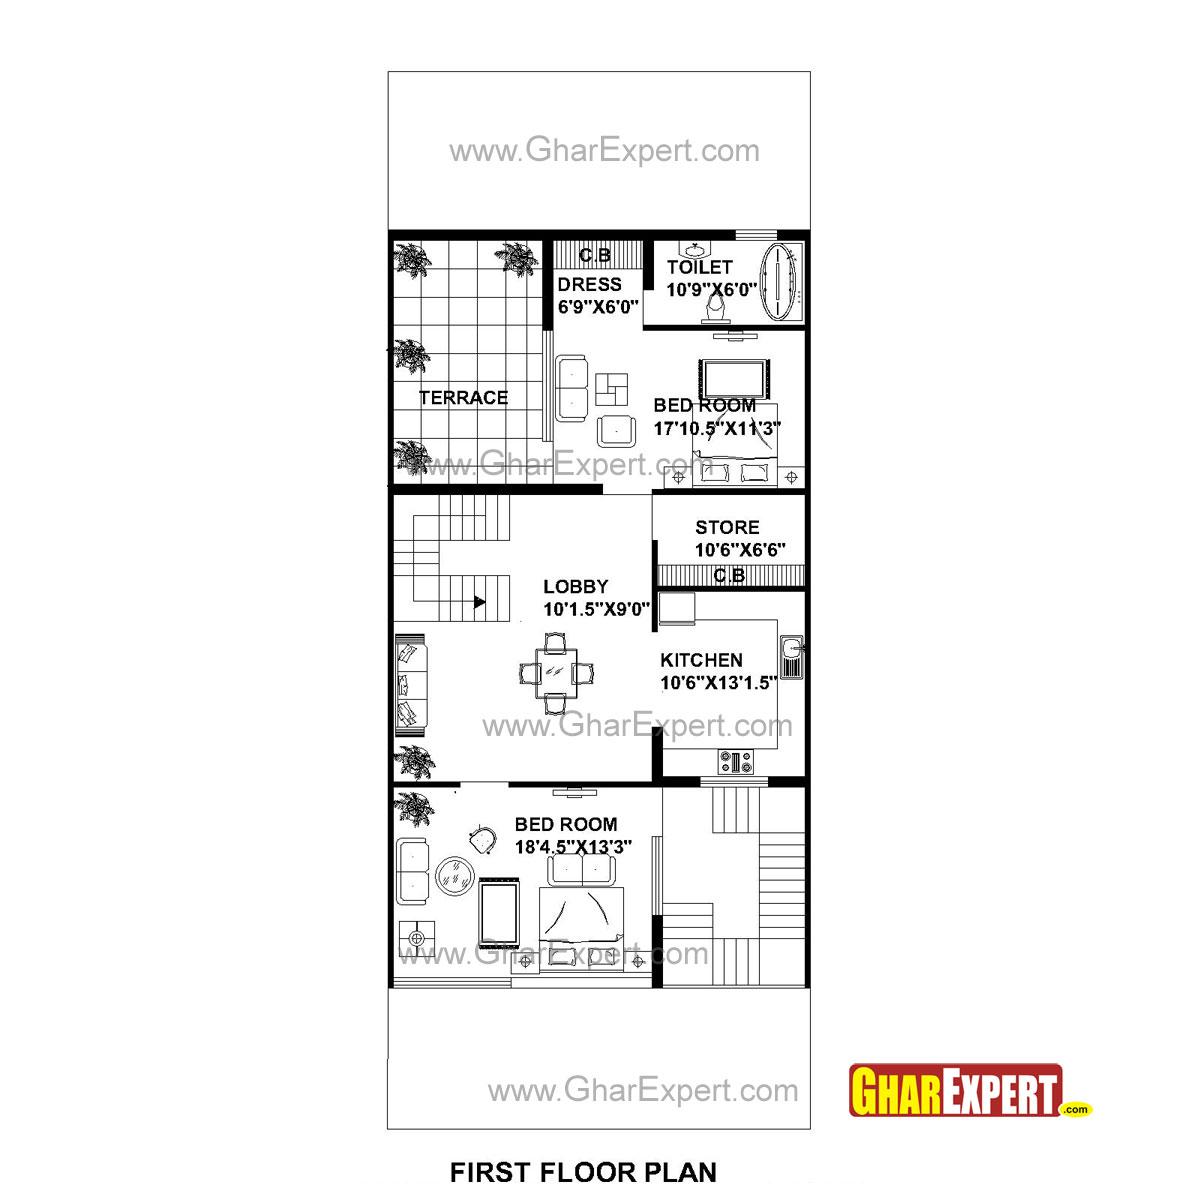 House Plan for 30 Feet by 75 Feet plot (Plot Size 250